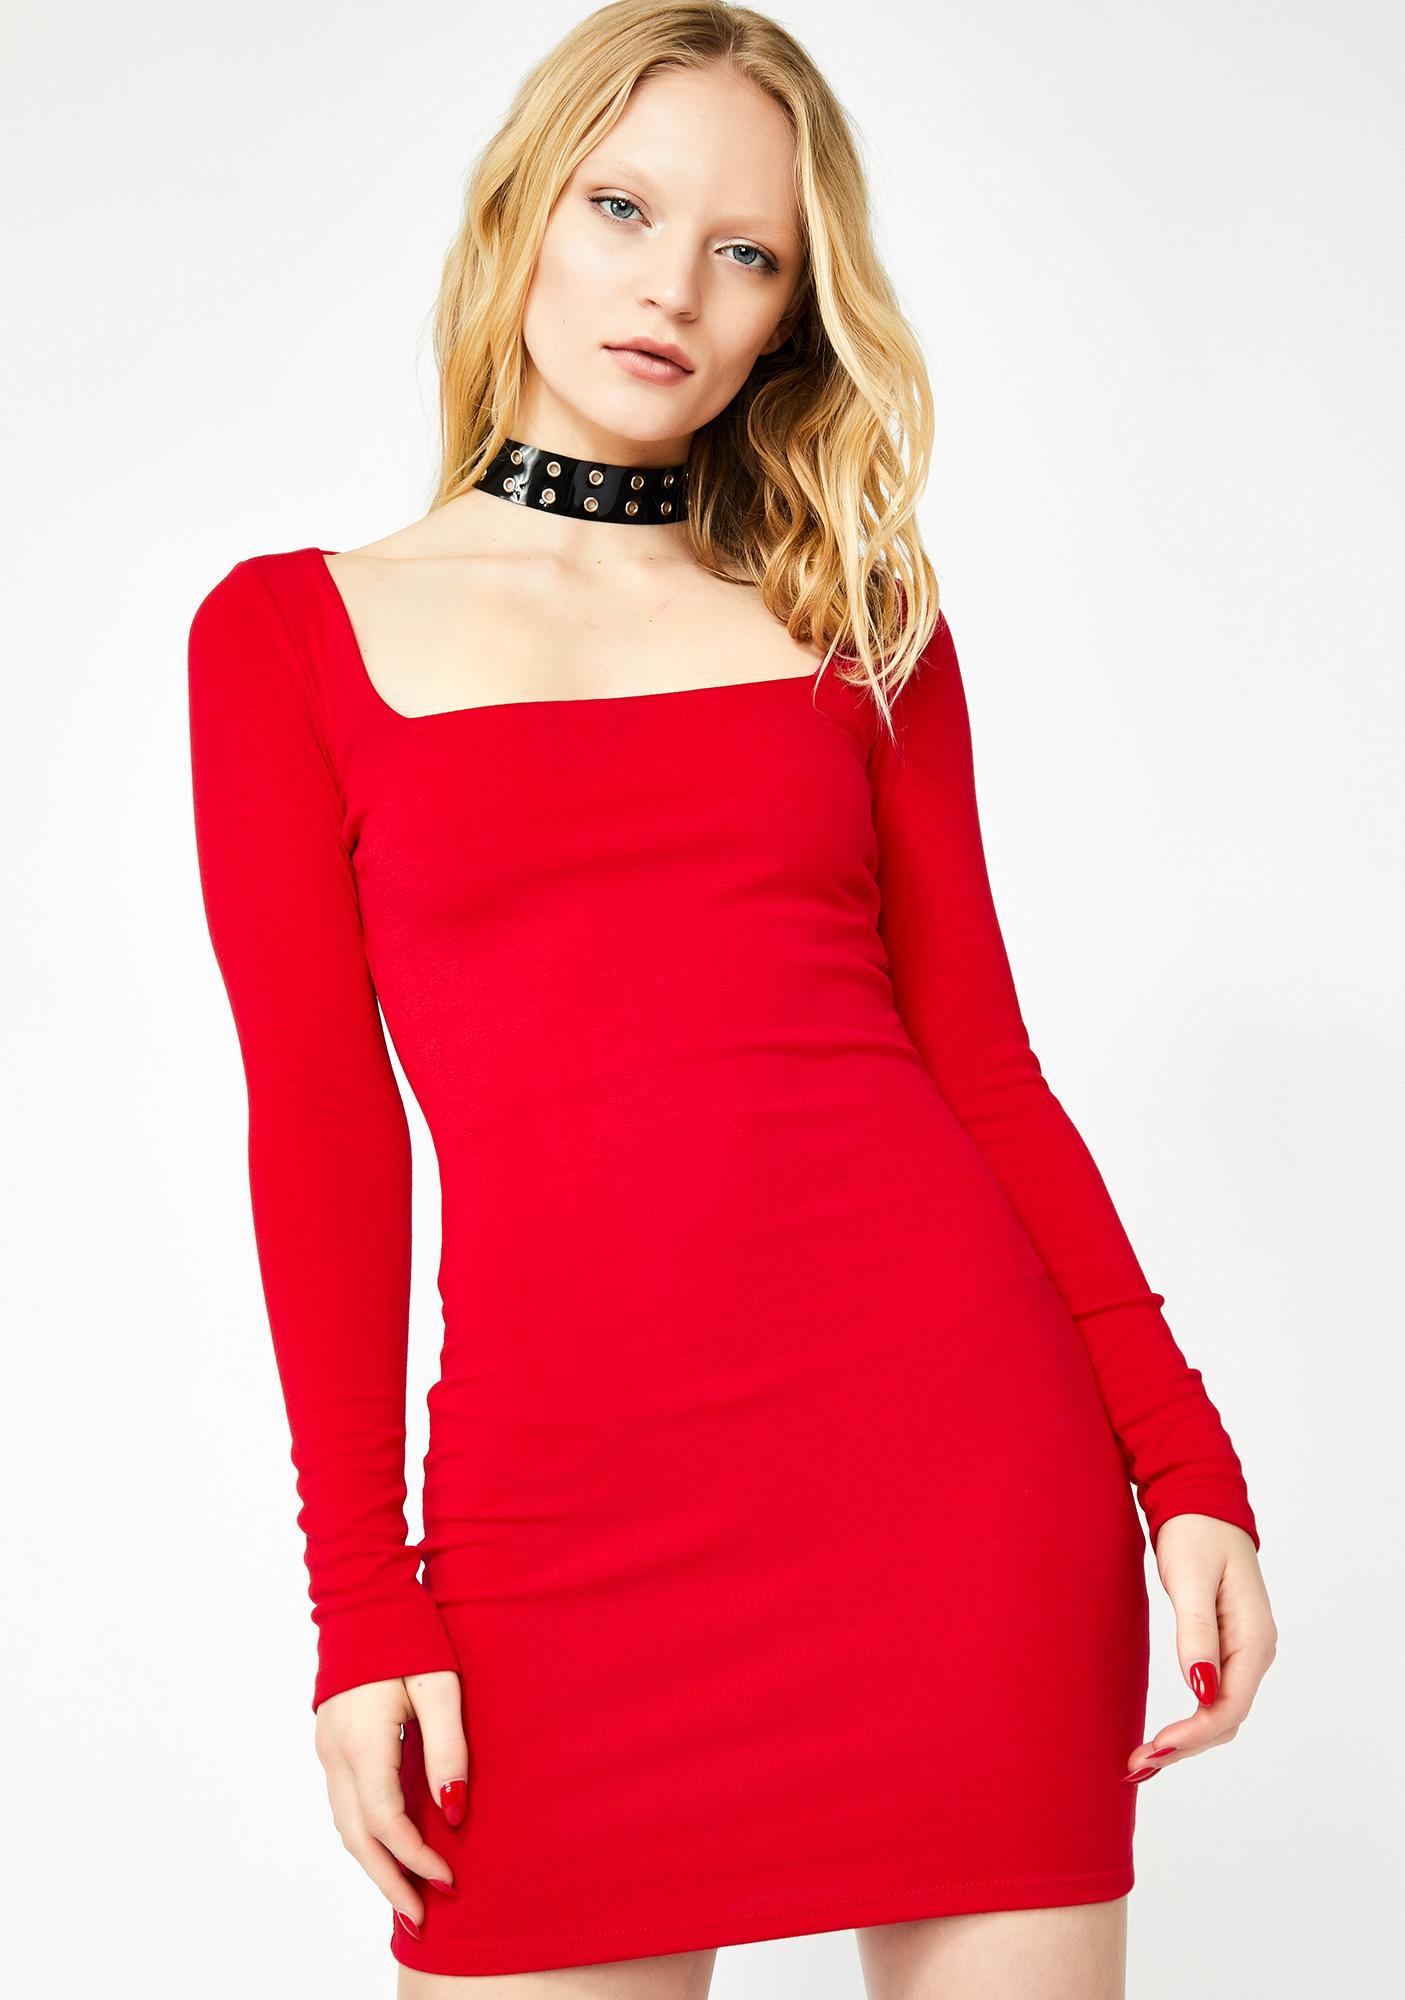 Burning Angst Mini Dress